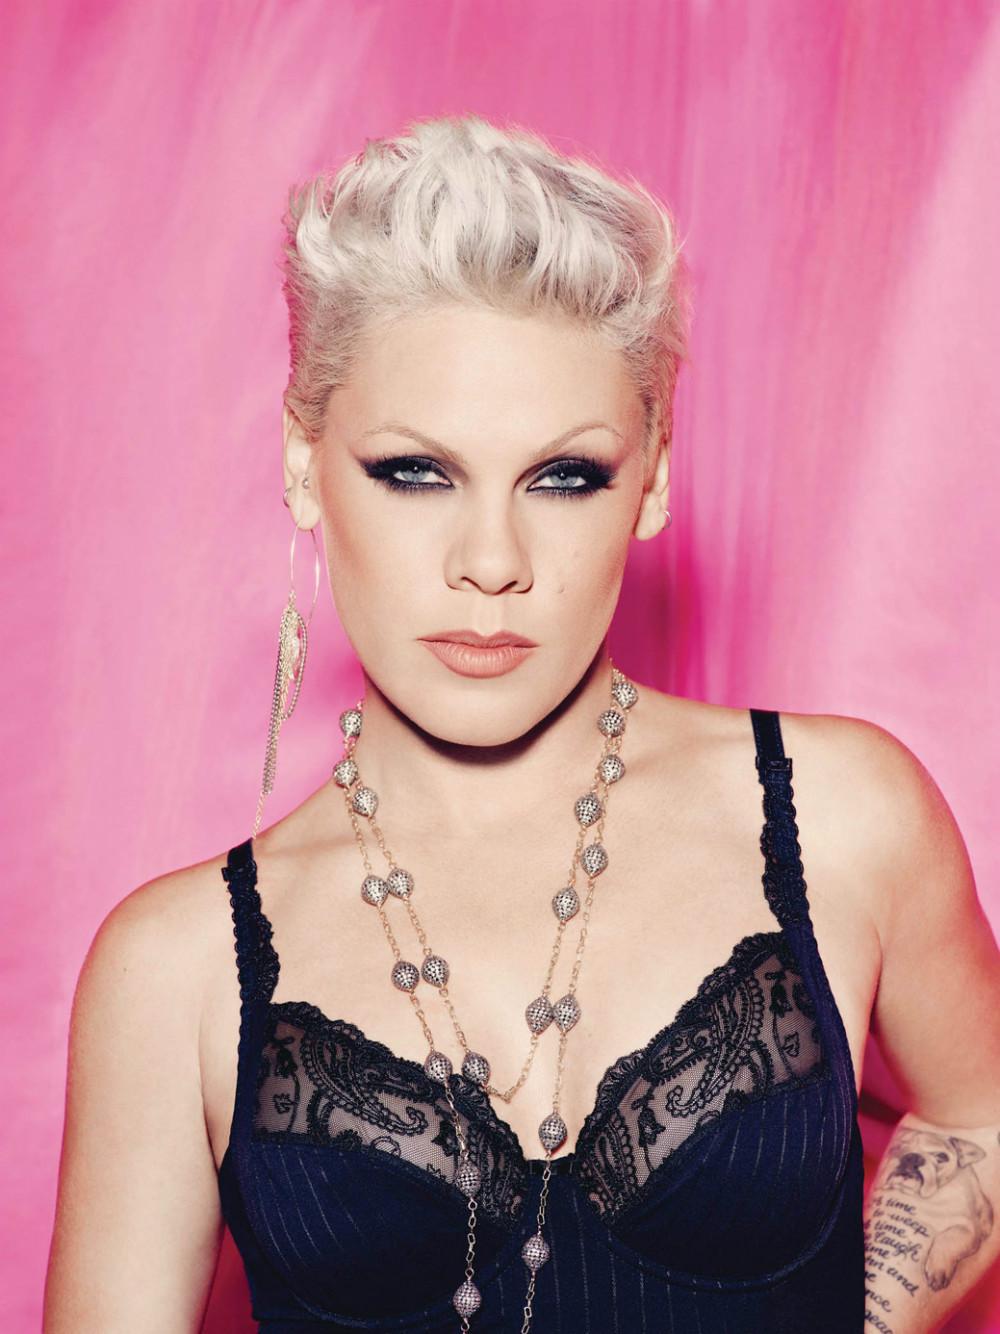 Alecia-Beth-Moore-P-nk-font-b-pink-b-font-Music-Star-Fabric-font-b-Poster.jpg